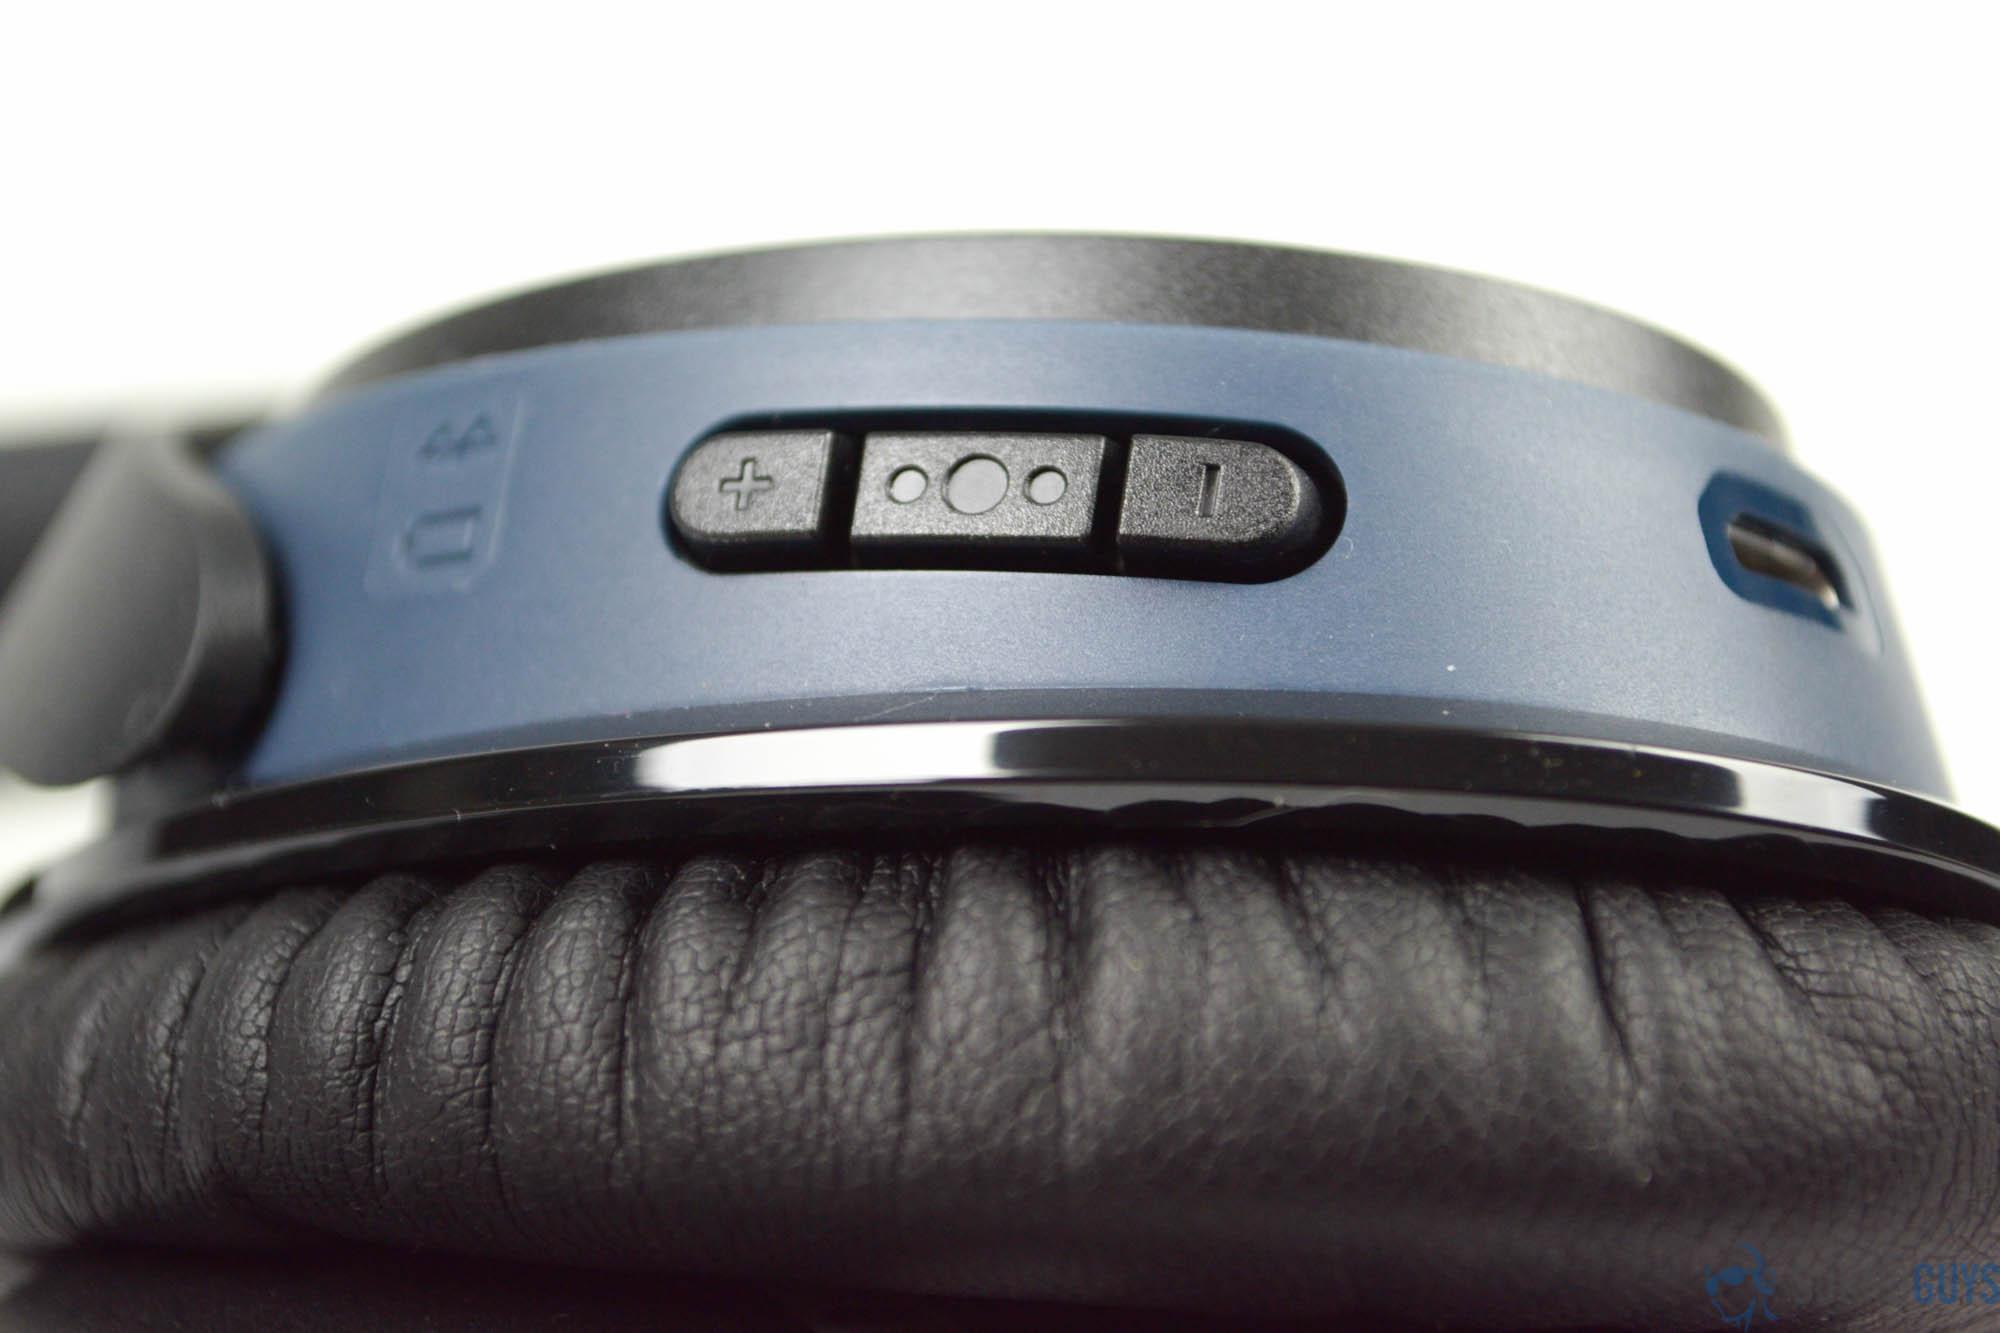 bbd4e87f753 Bose SoundLink Around-Ear Wireless Headphone II Review